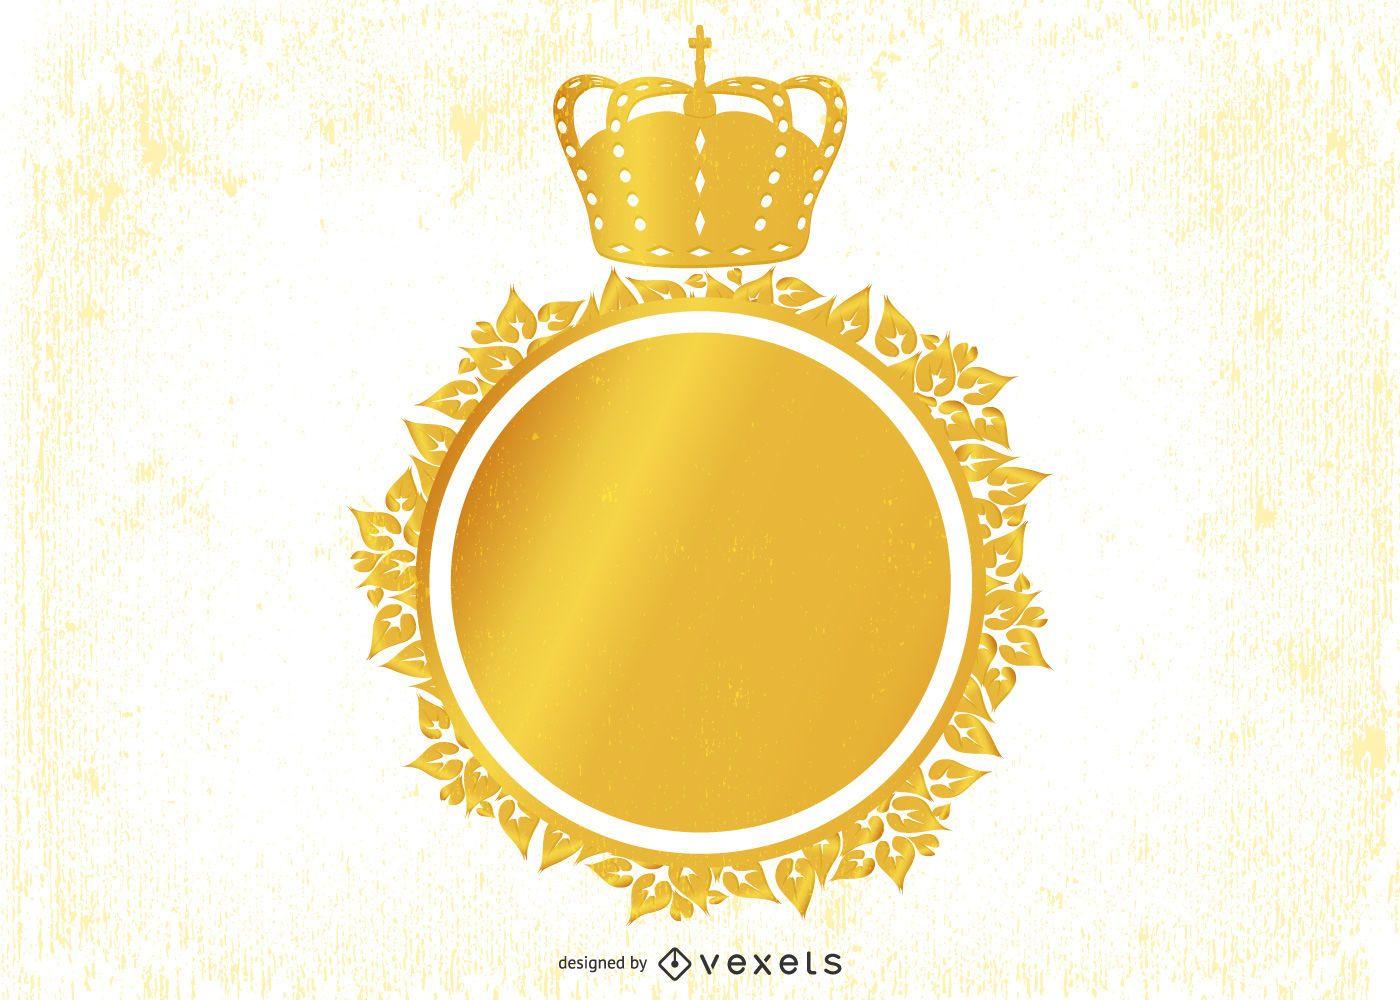 Vintage Heraldic Decorative Emblem